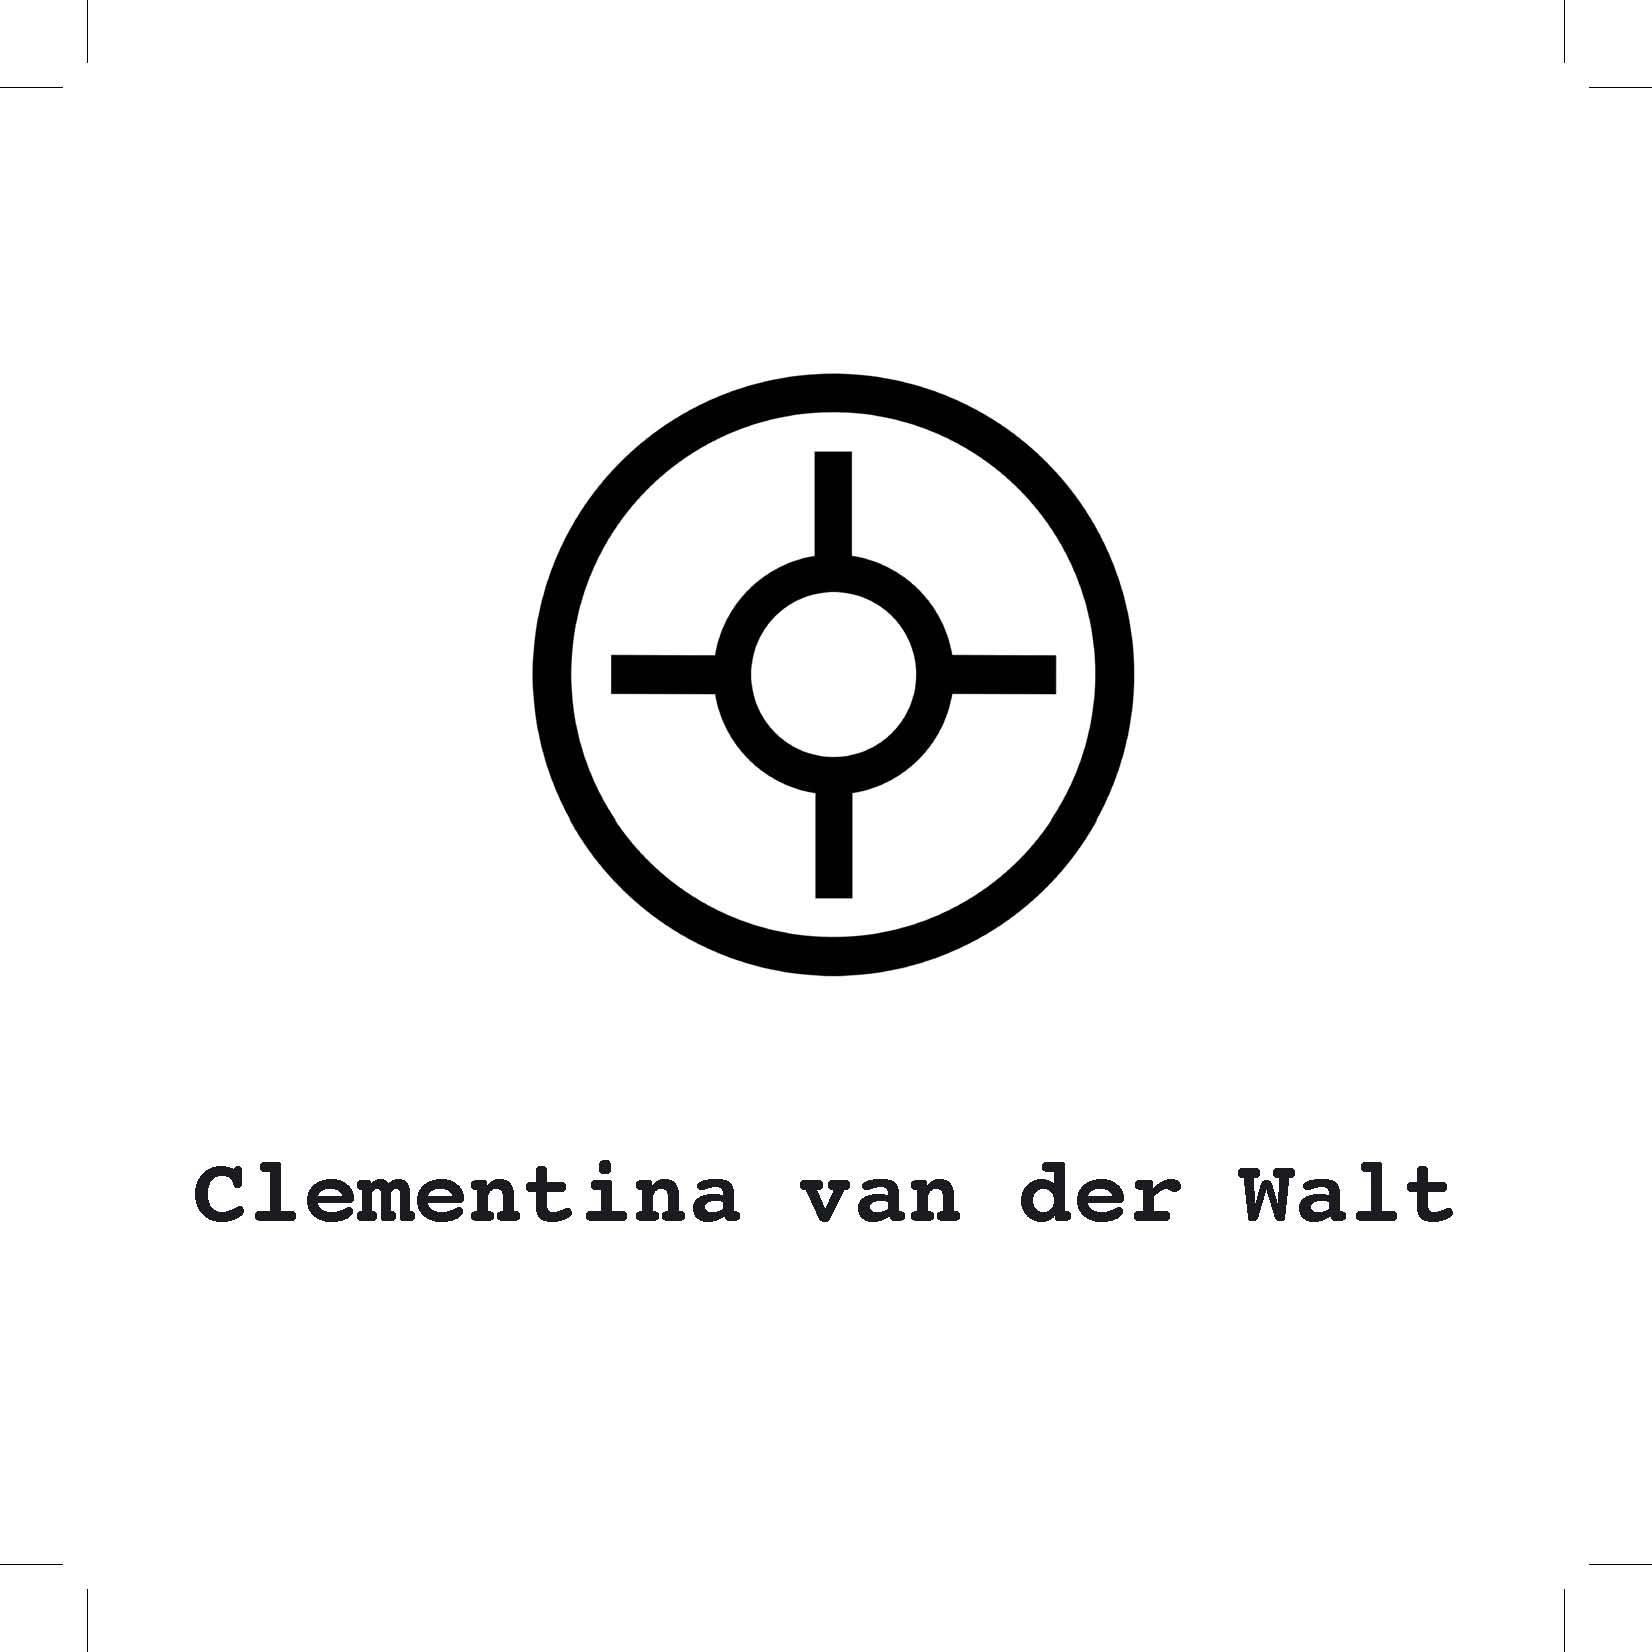 MAP Southafrica - Clementina van der Walt